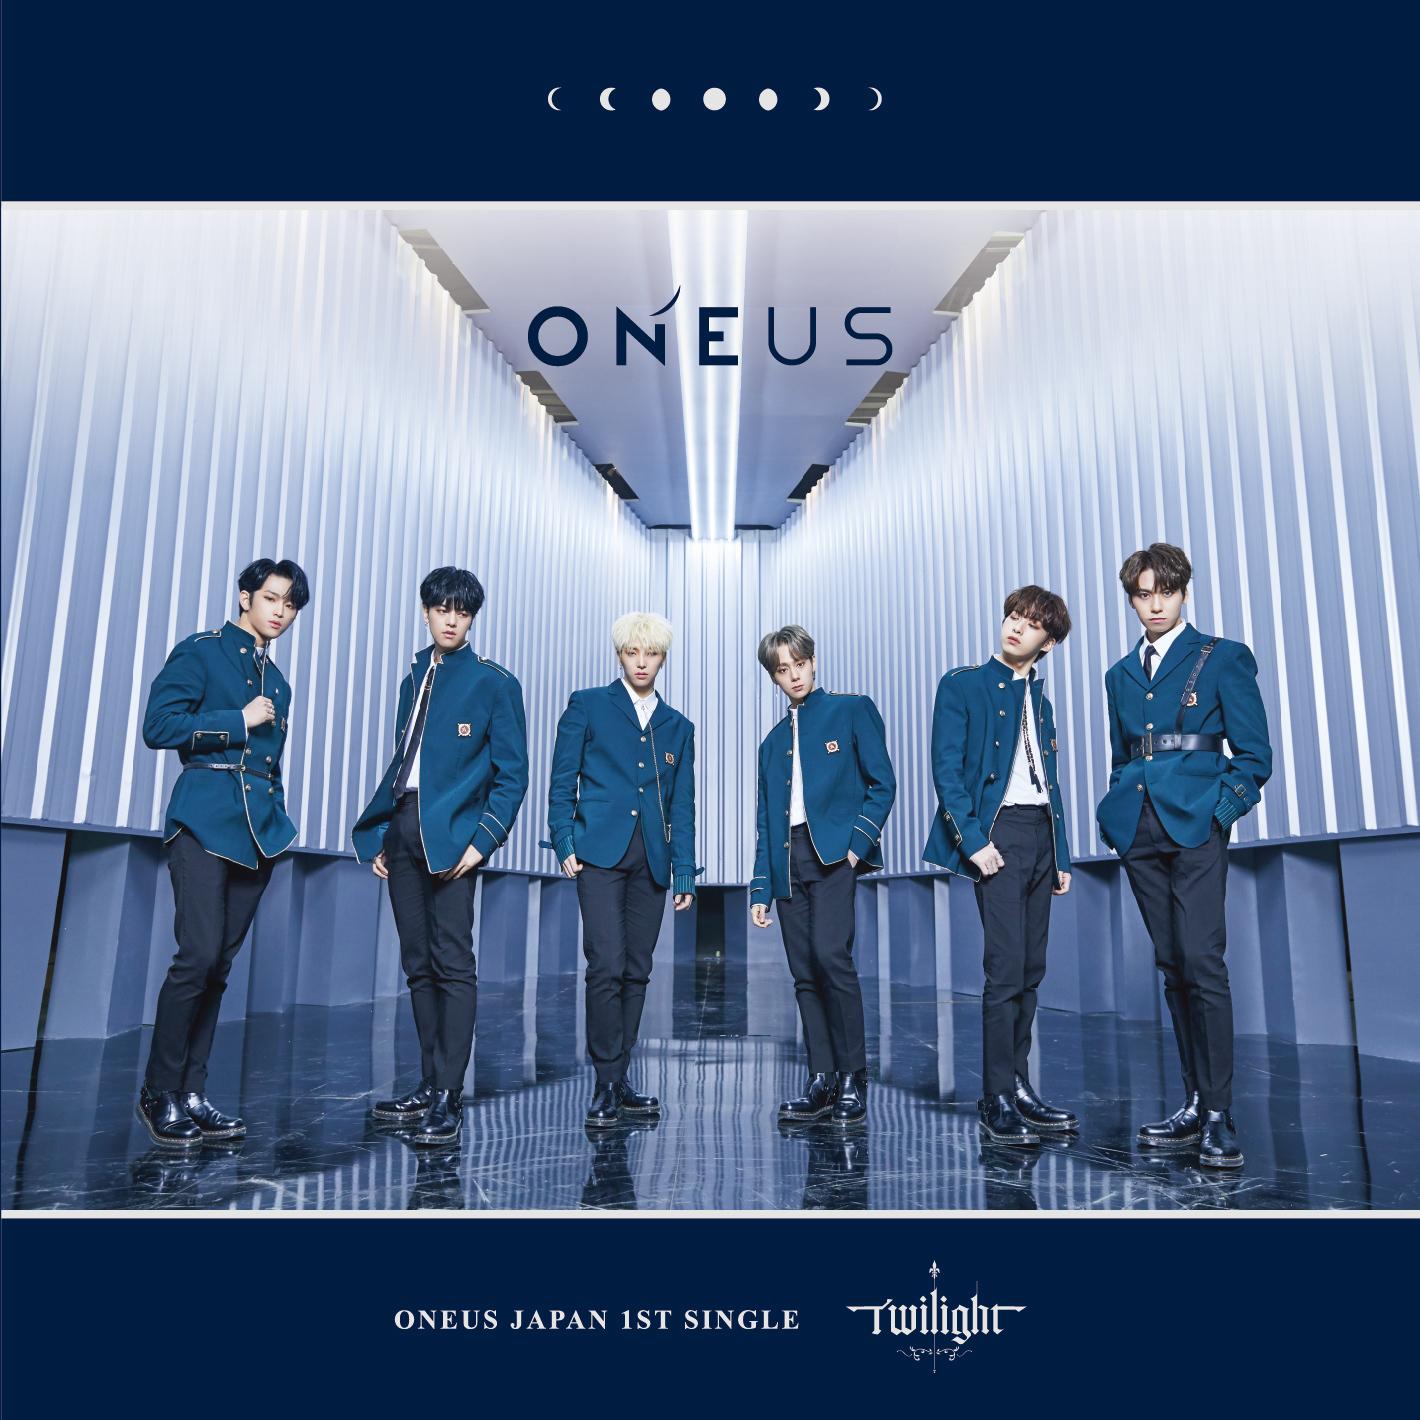 ONEUS Japan 1st Single「Twilight」通常盤A